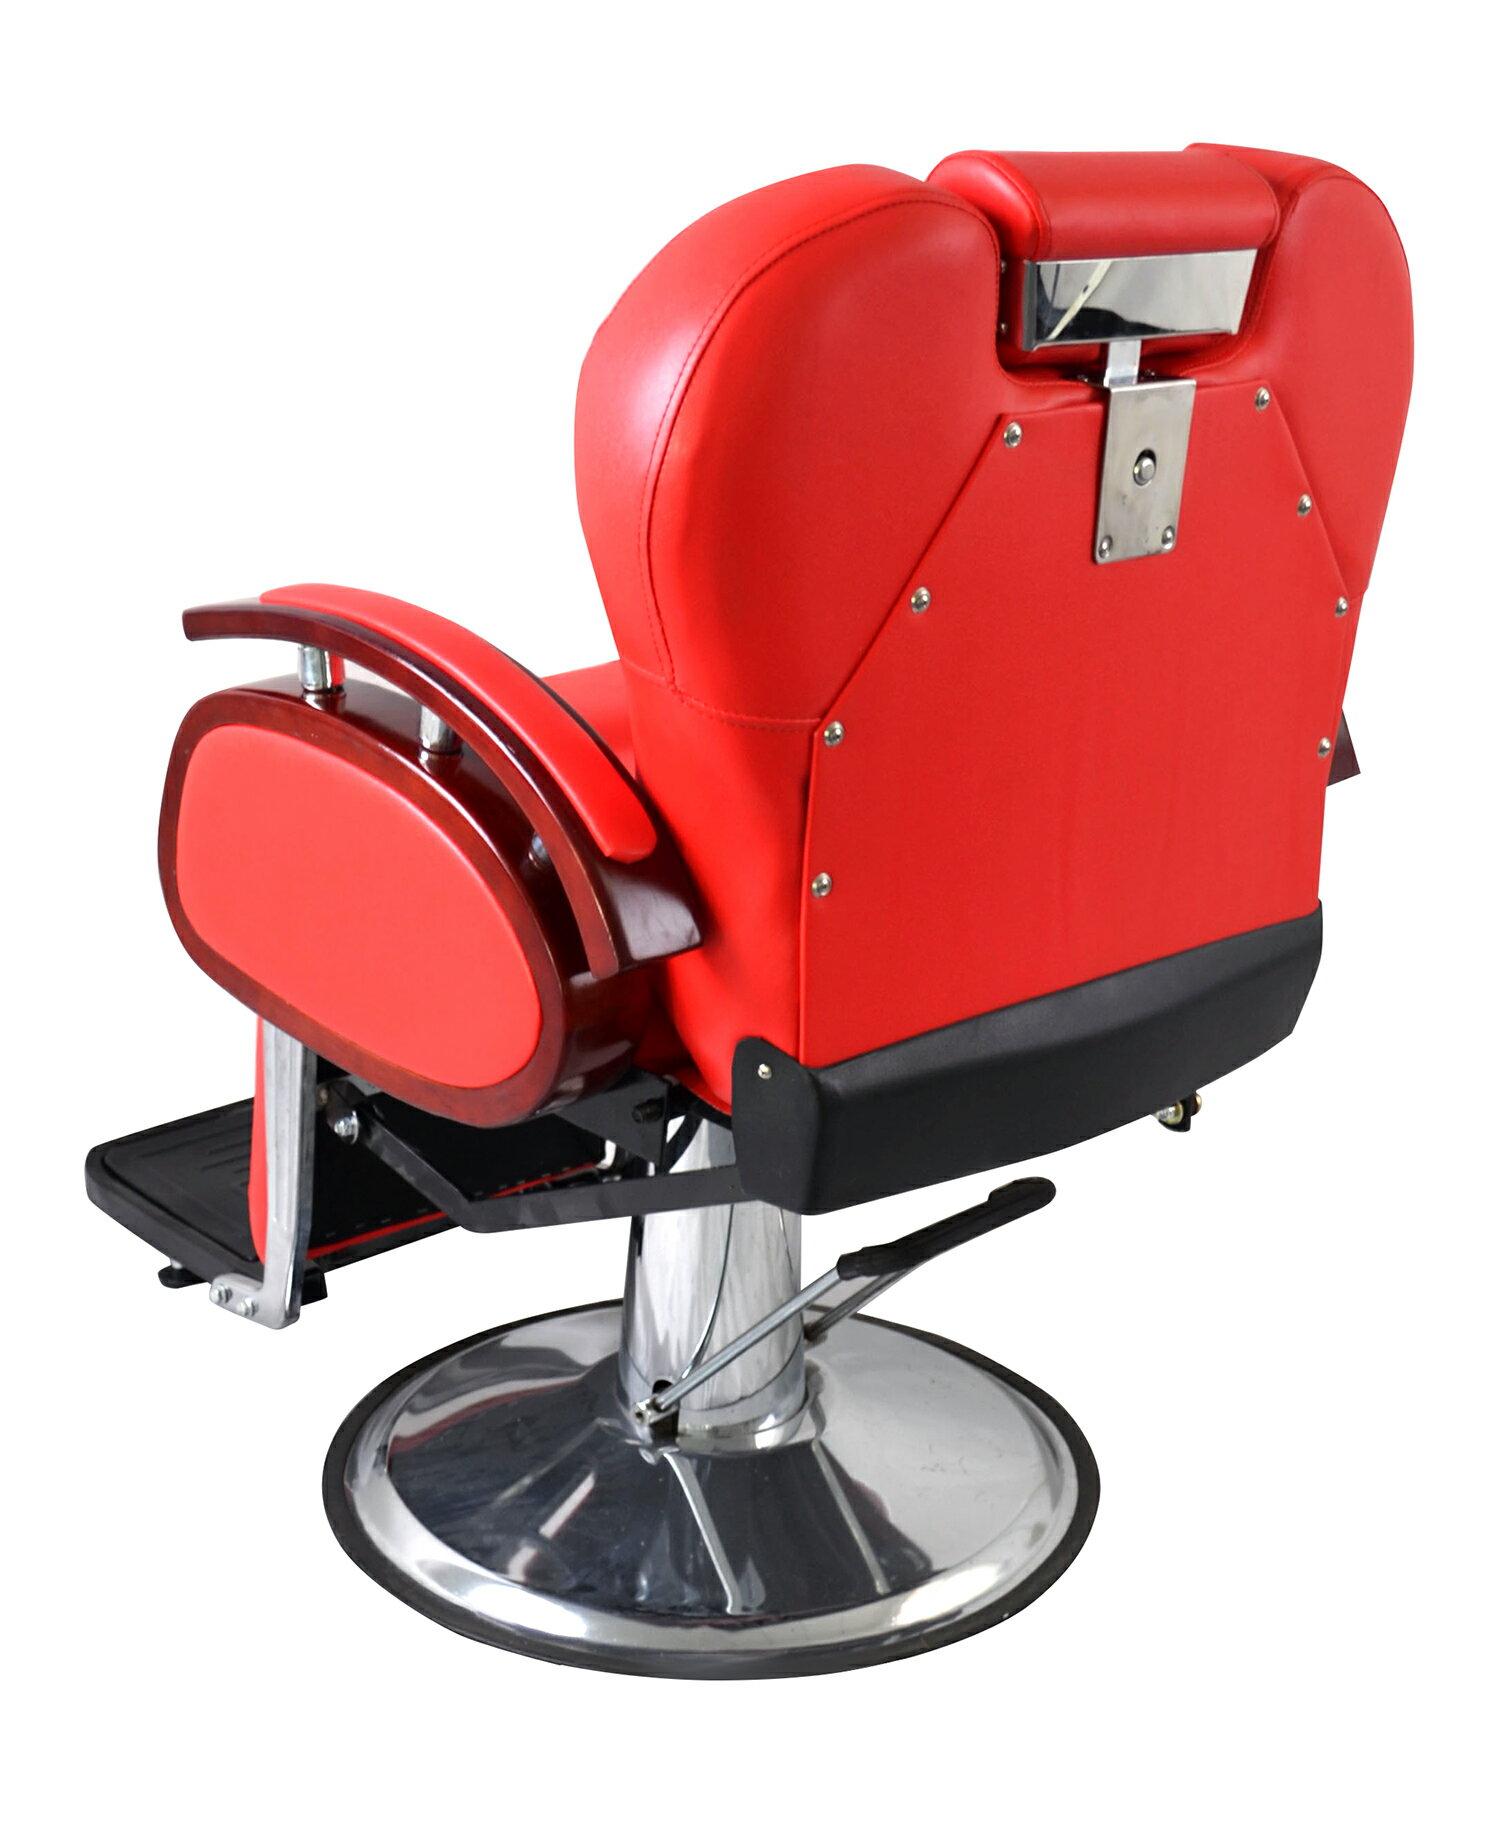 BarberPub All Purpose Hydraulic Recline Barber Chair Salon Beauty Spa Shampoo Equipment 8705 6